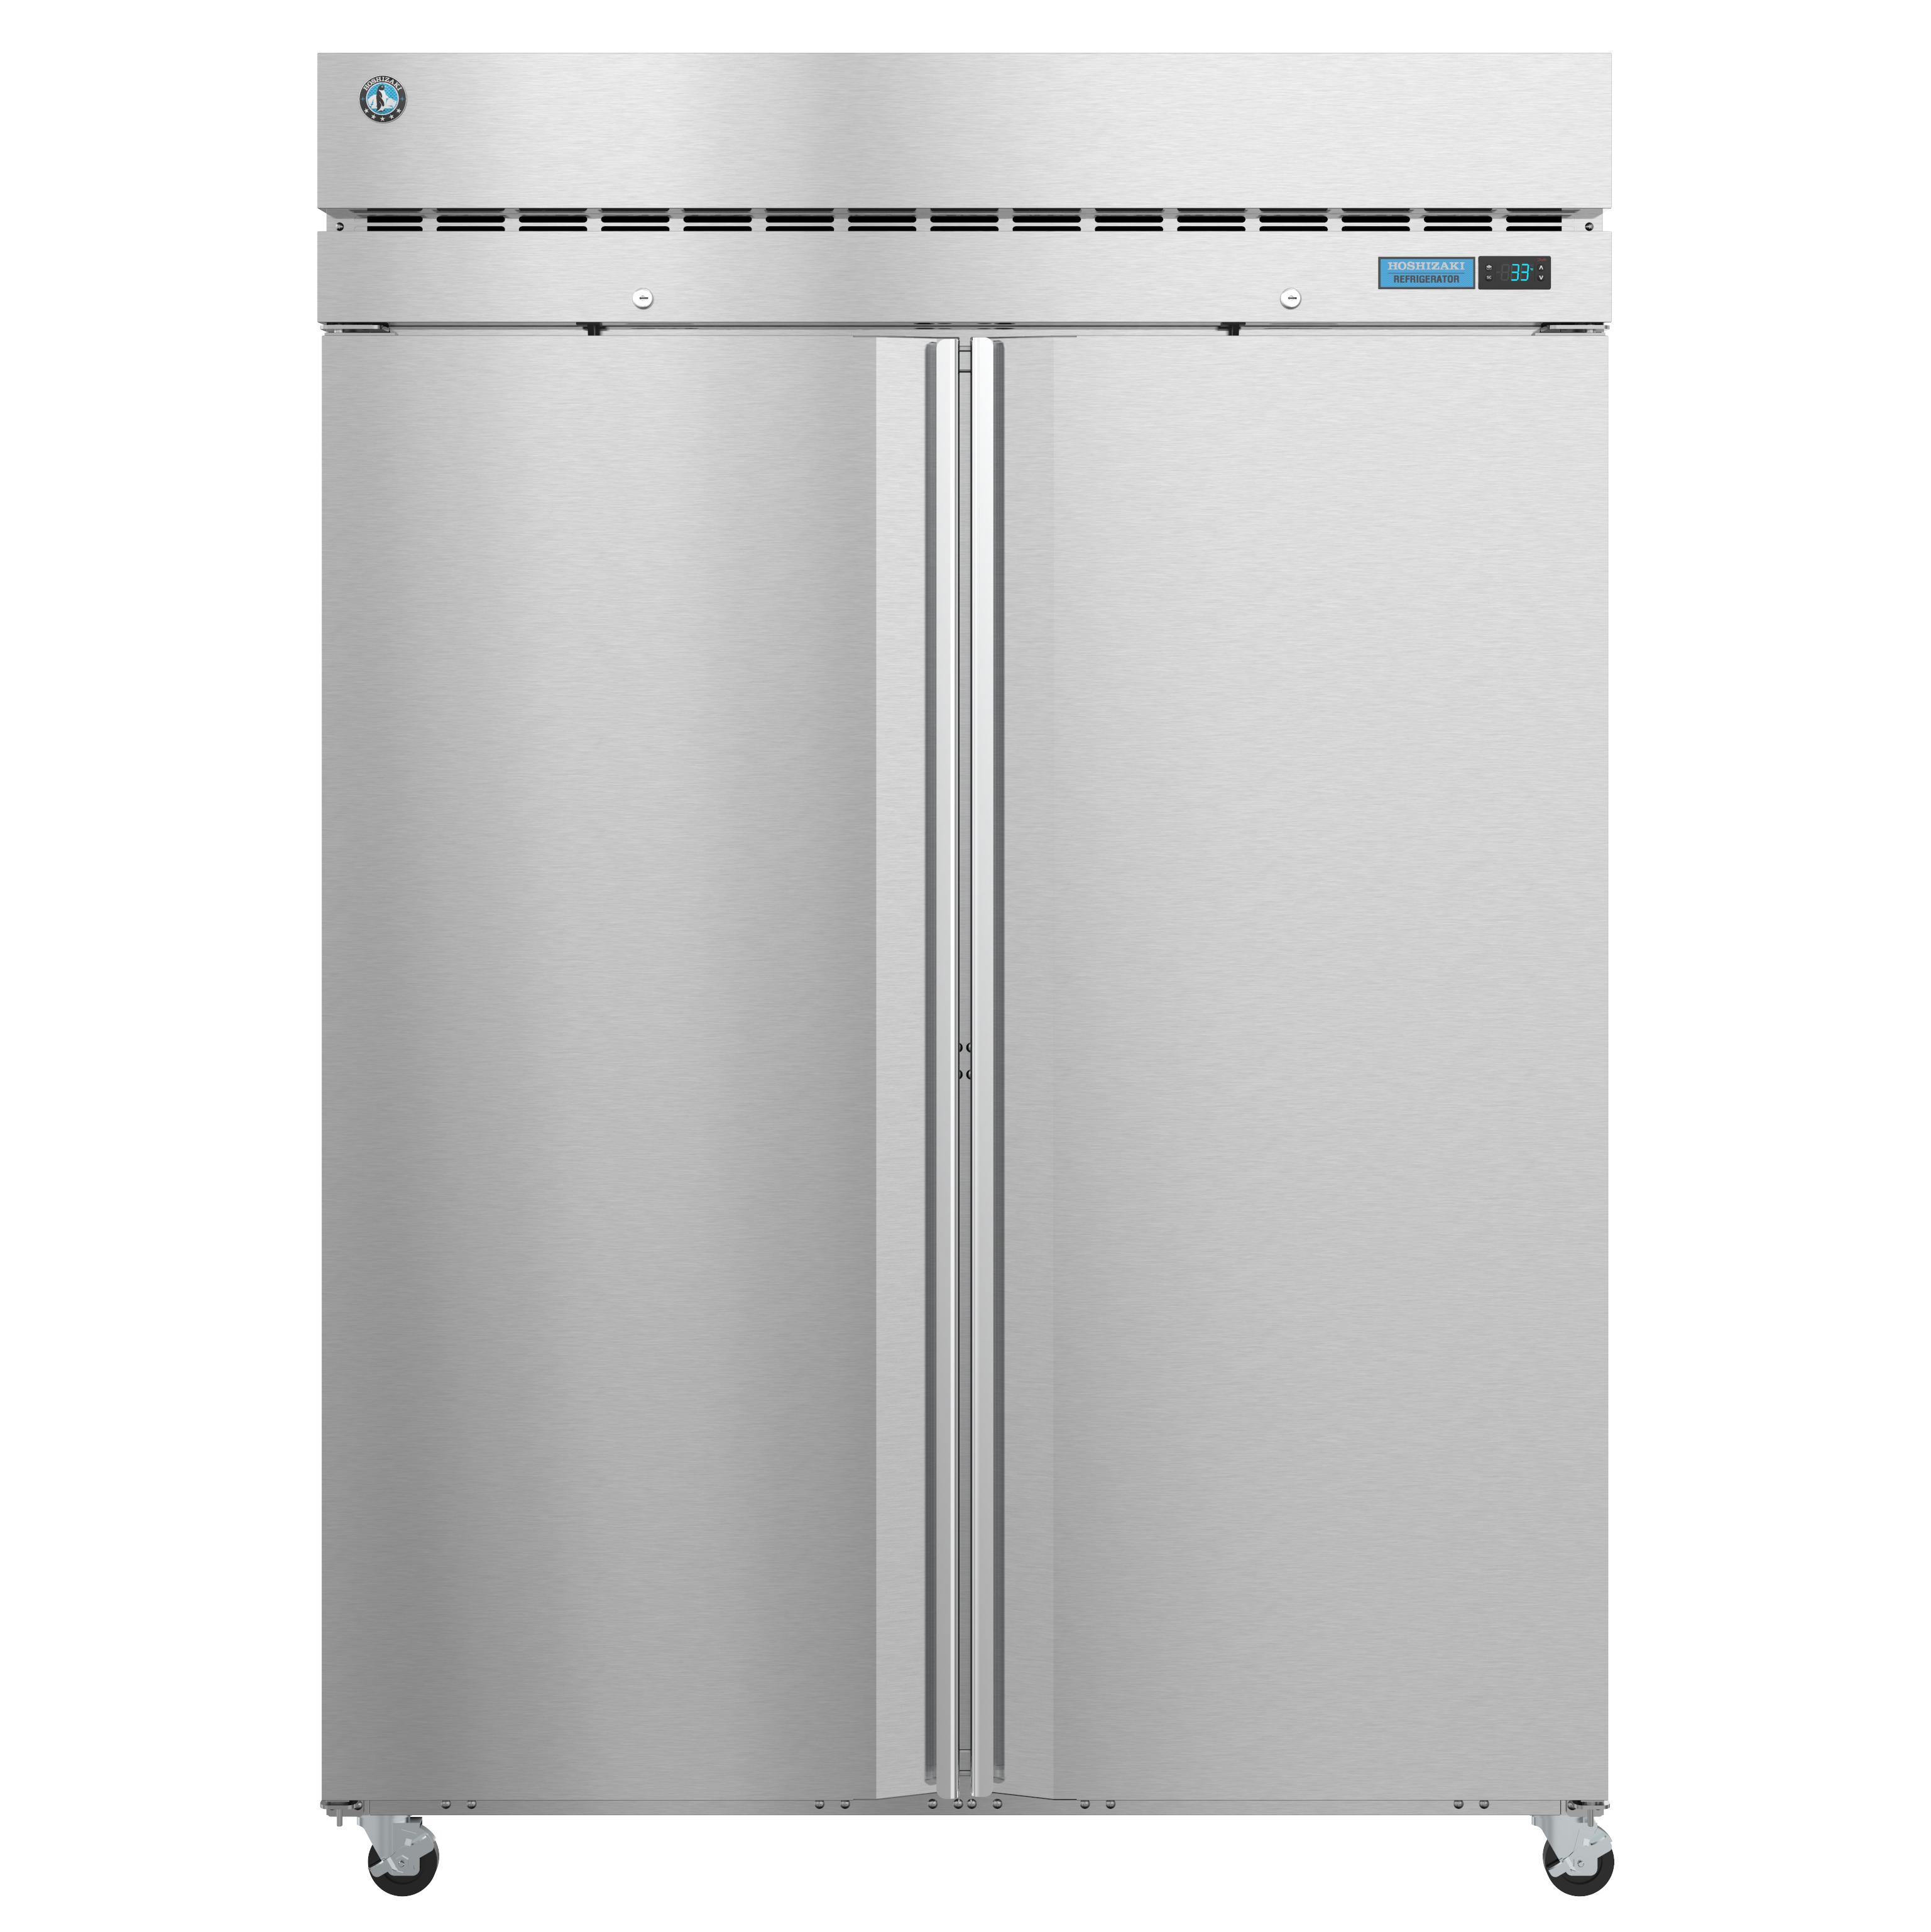 Hoshizaki R2A-FS reach-in refrigerators & freezers